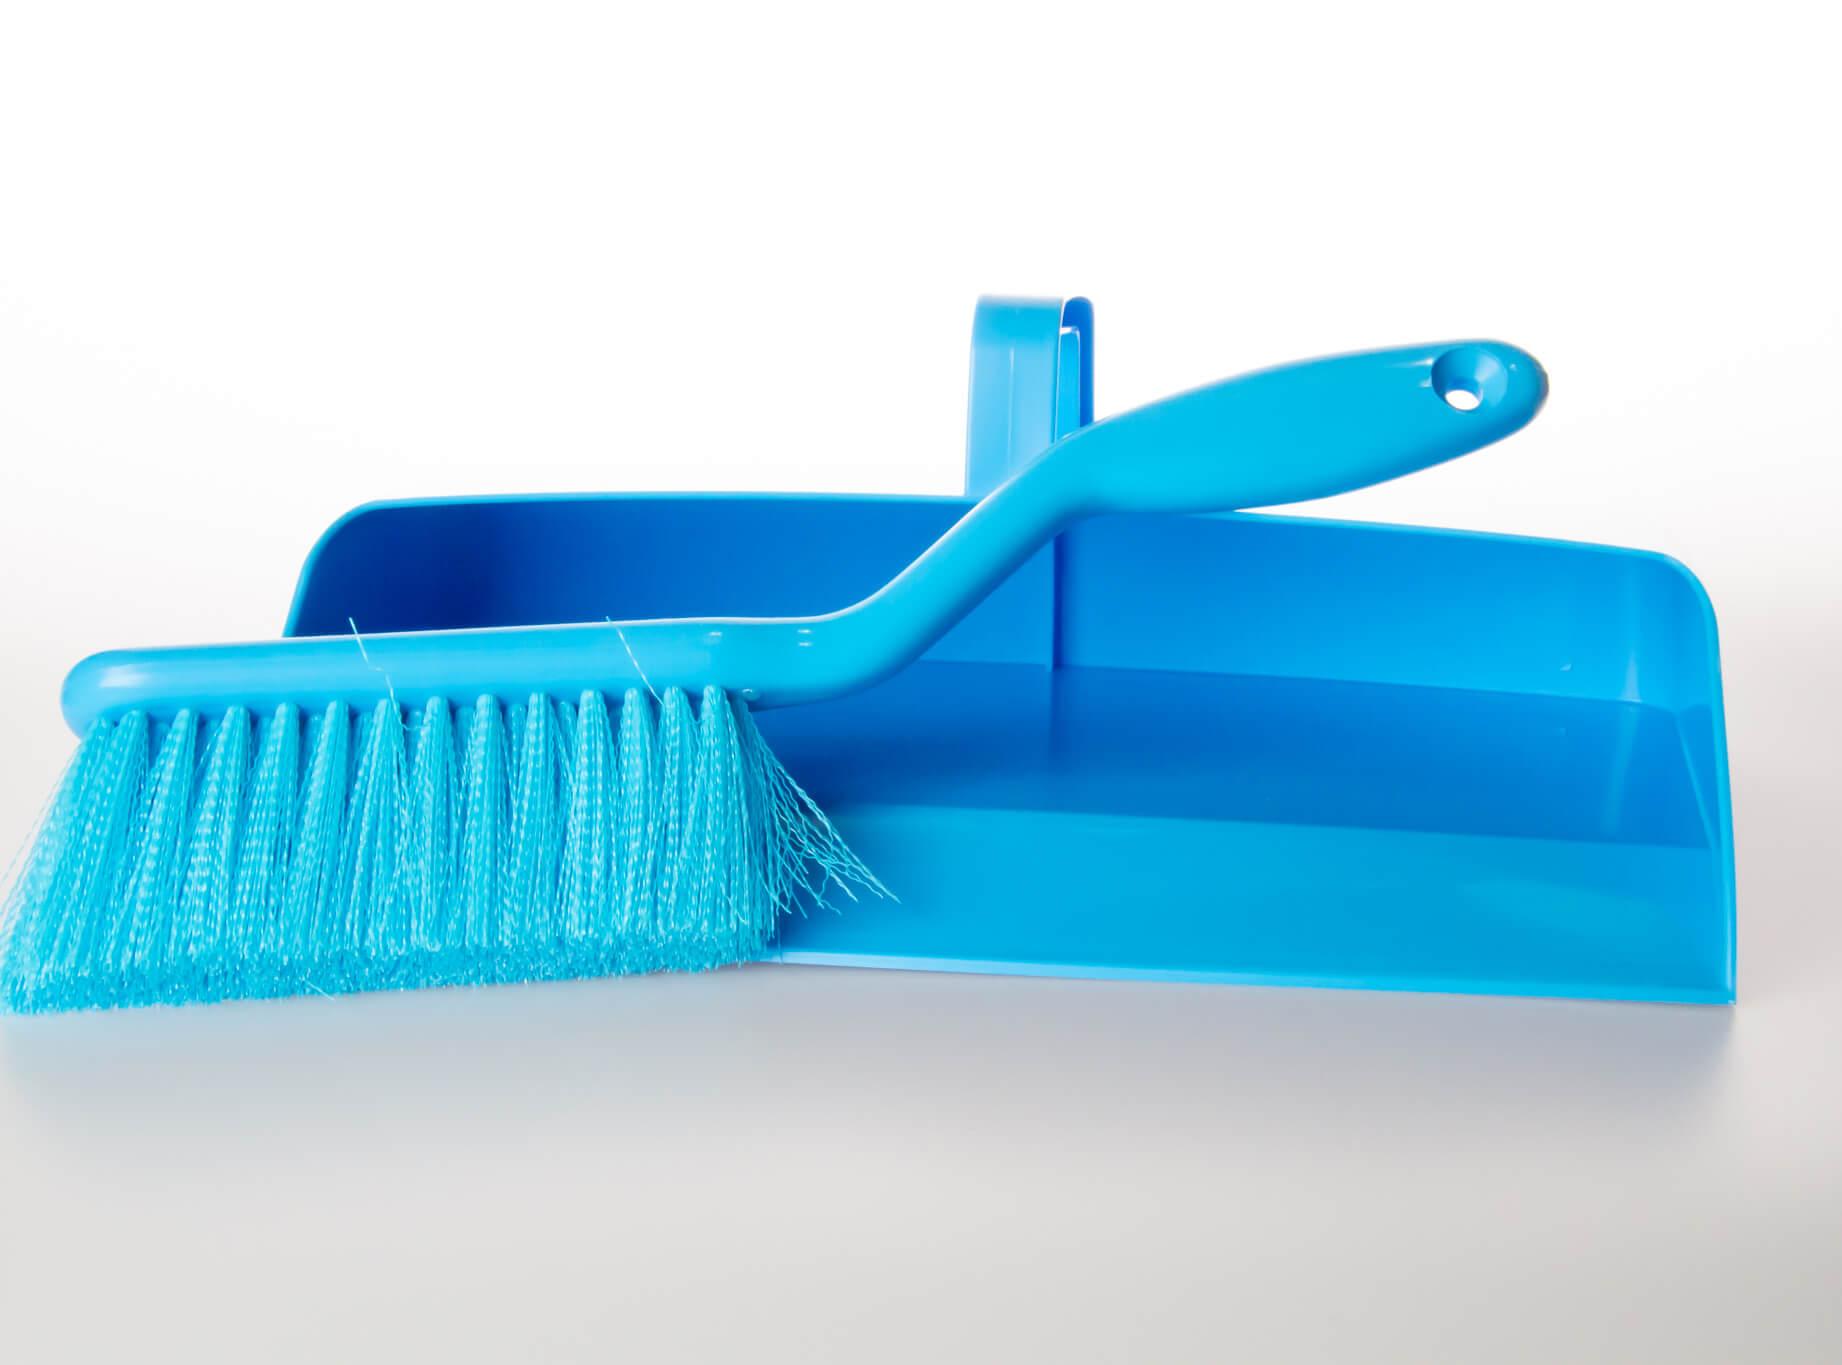 Creeds Dustpans & Brushes